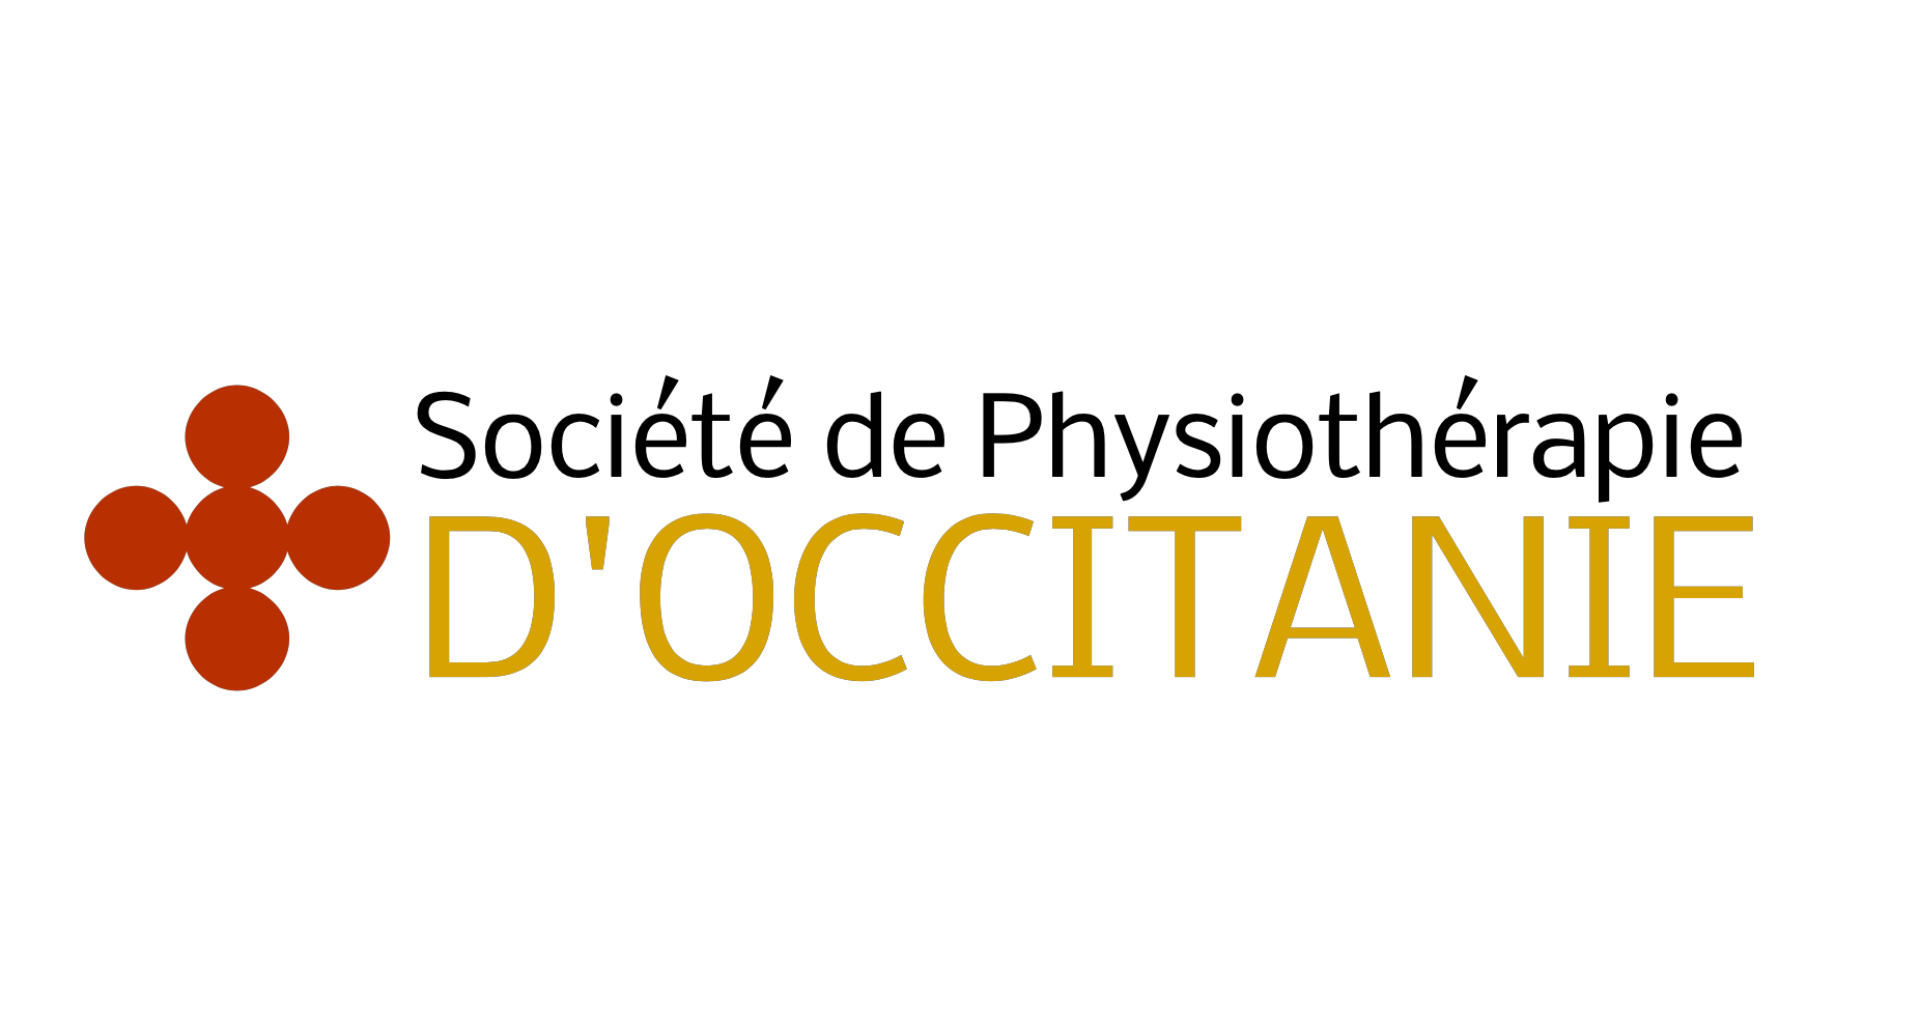 Société de Physiothérapie d'Occitanie